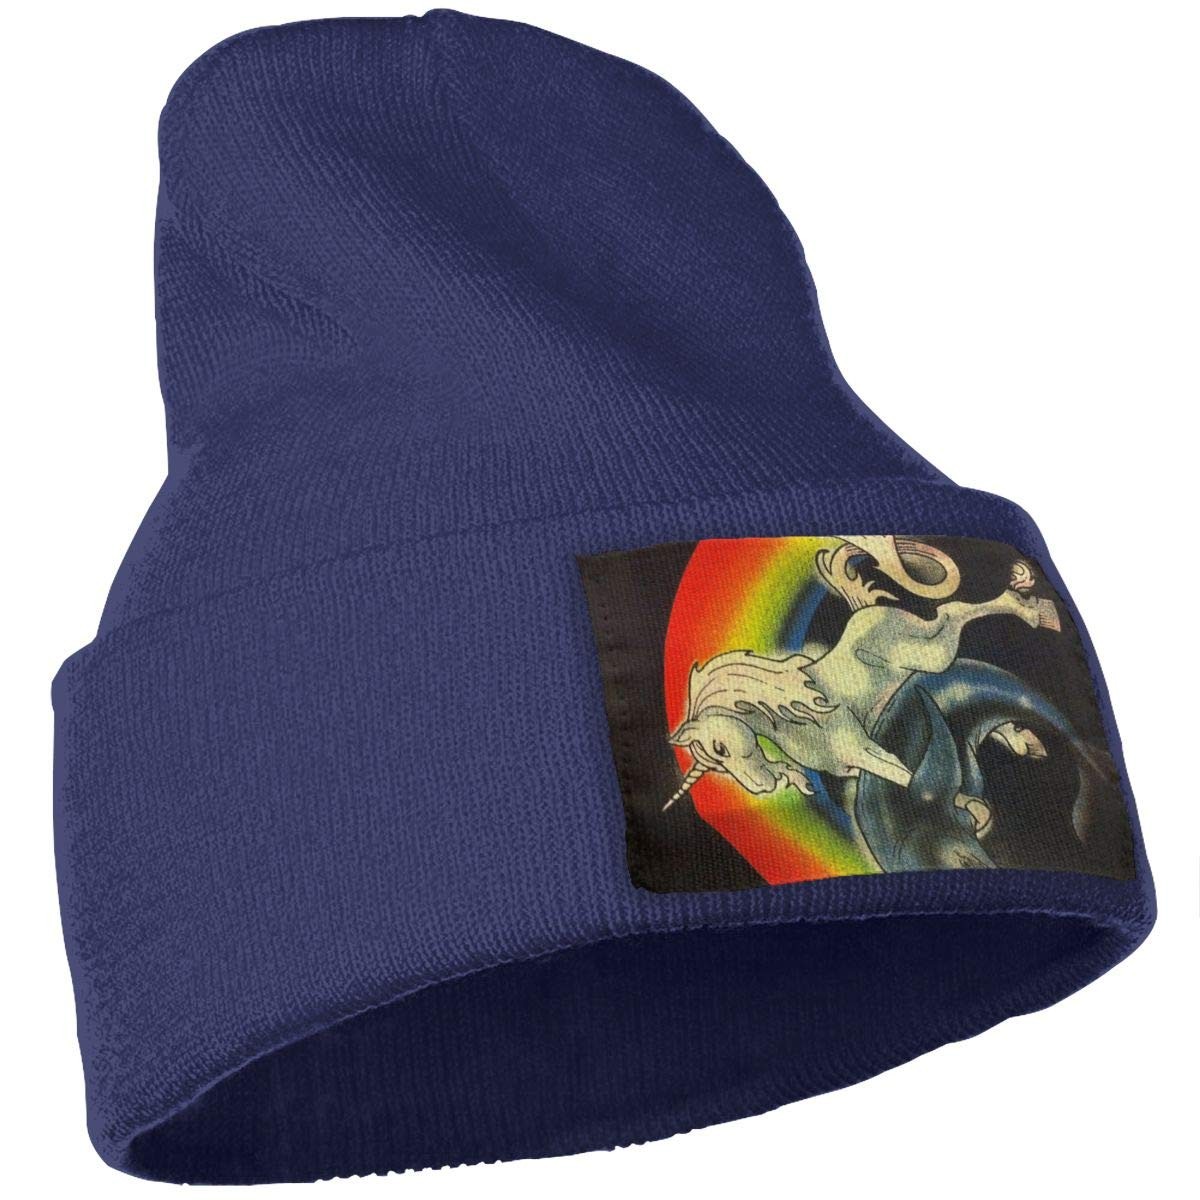 Unicorn Pounding Dolphin Unisex Winter Knitting Woolen Hat Warm Cap